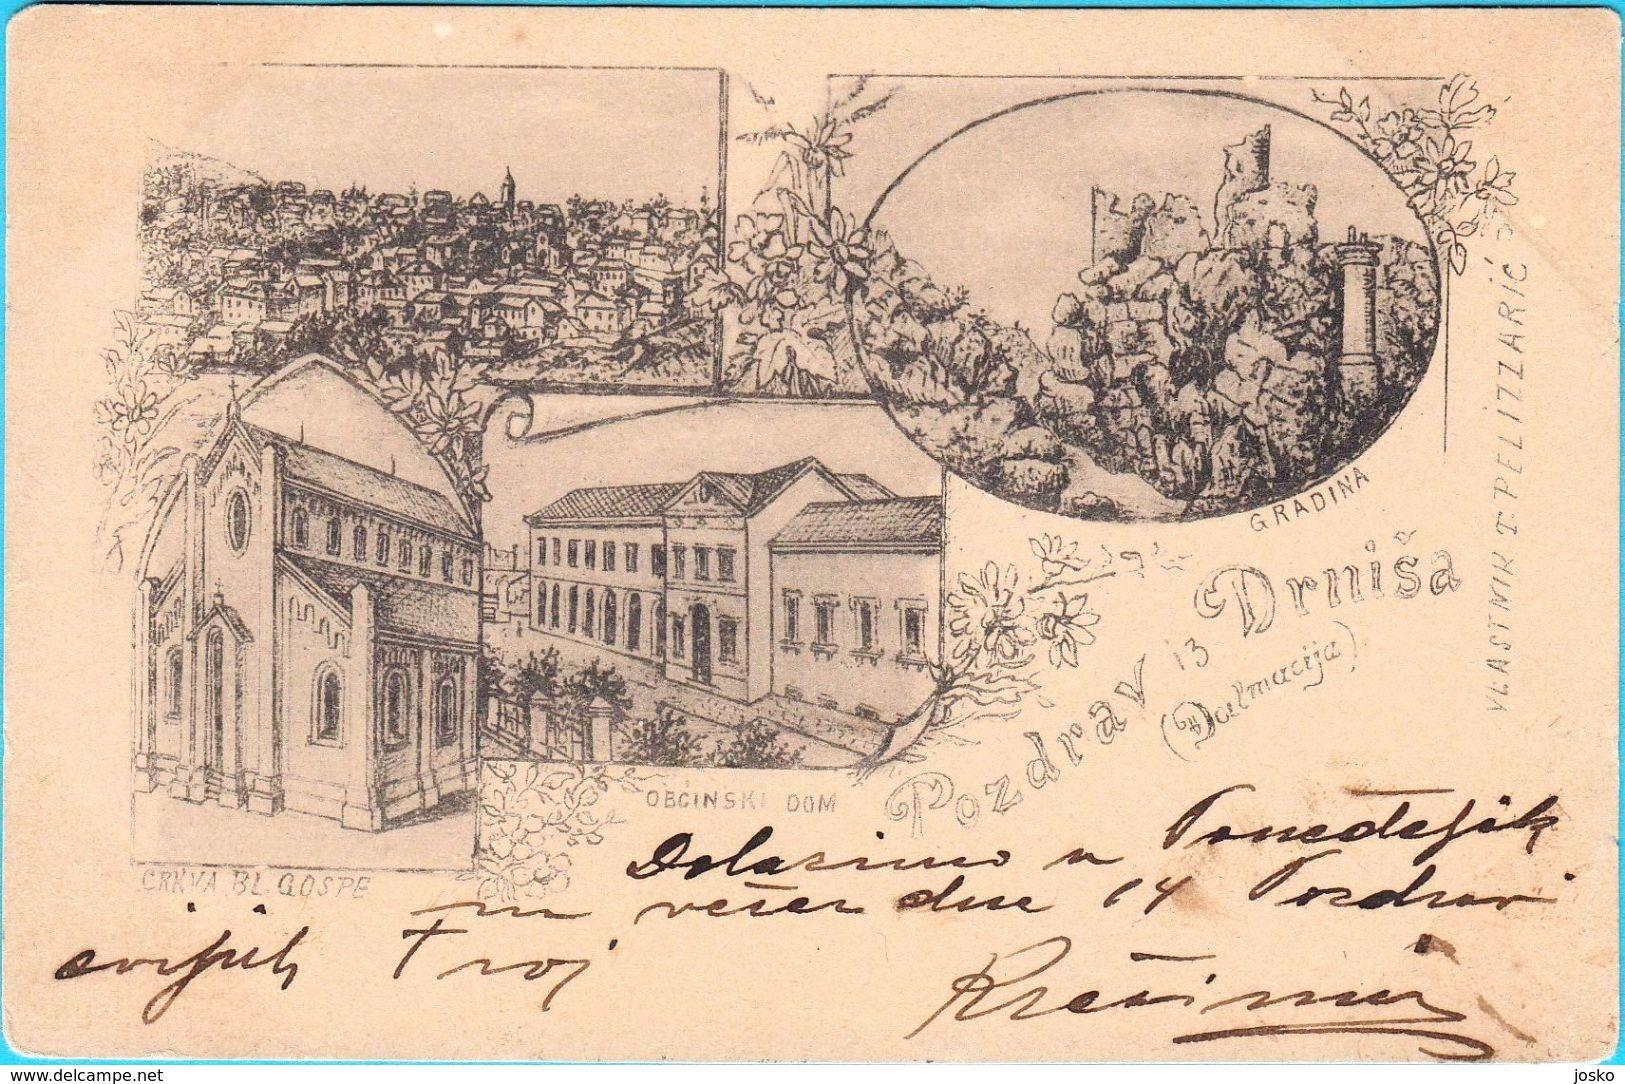 DRNIS - Pozdrav Iz Drnisa * LITHO * ( Croatia ) * Travelled 1899. * Vlastnik T. Pelizzaric * Litography - Croatia